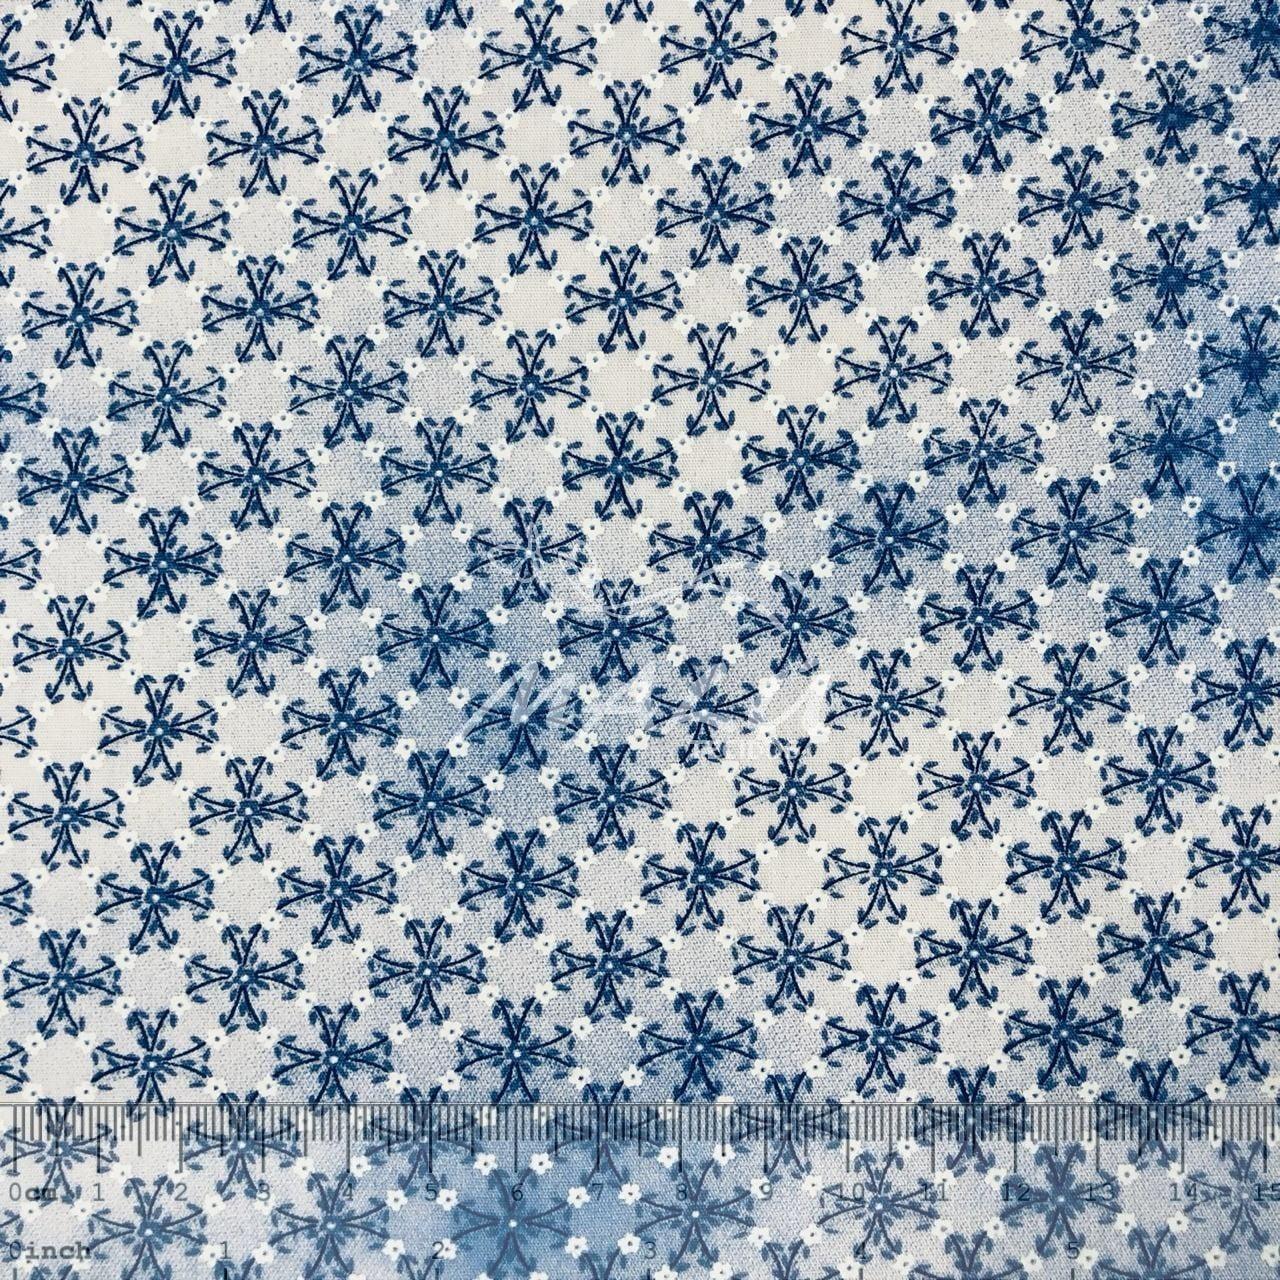 Tricoline Floral Esponjado Azul